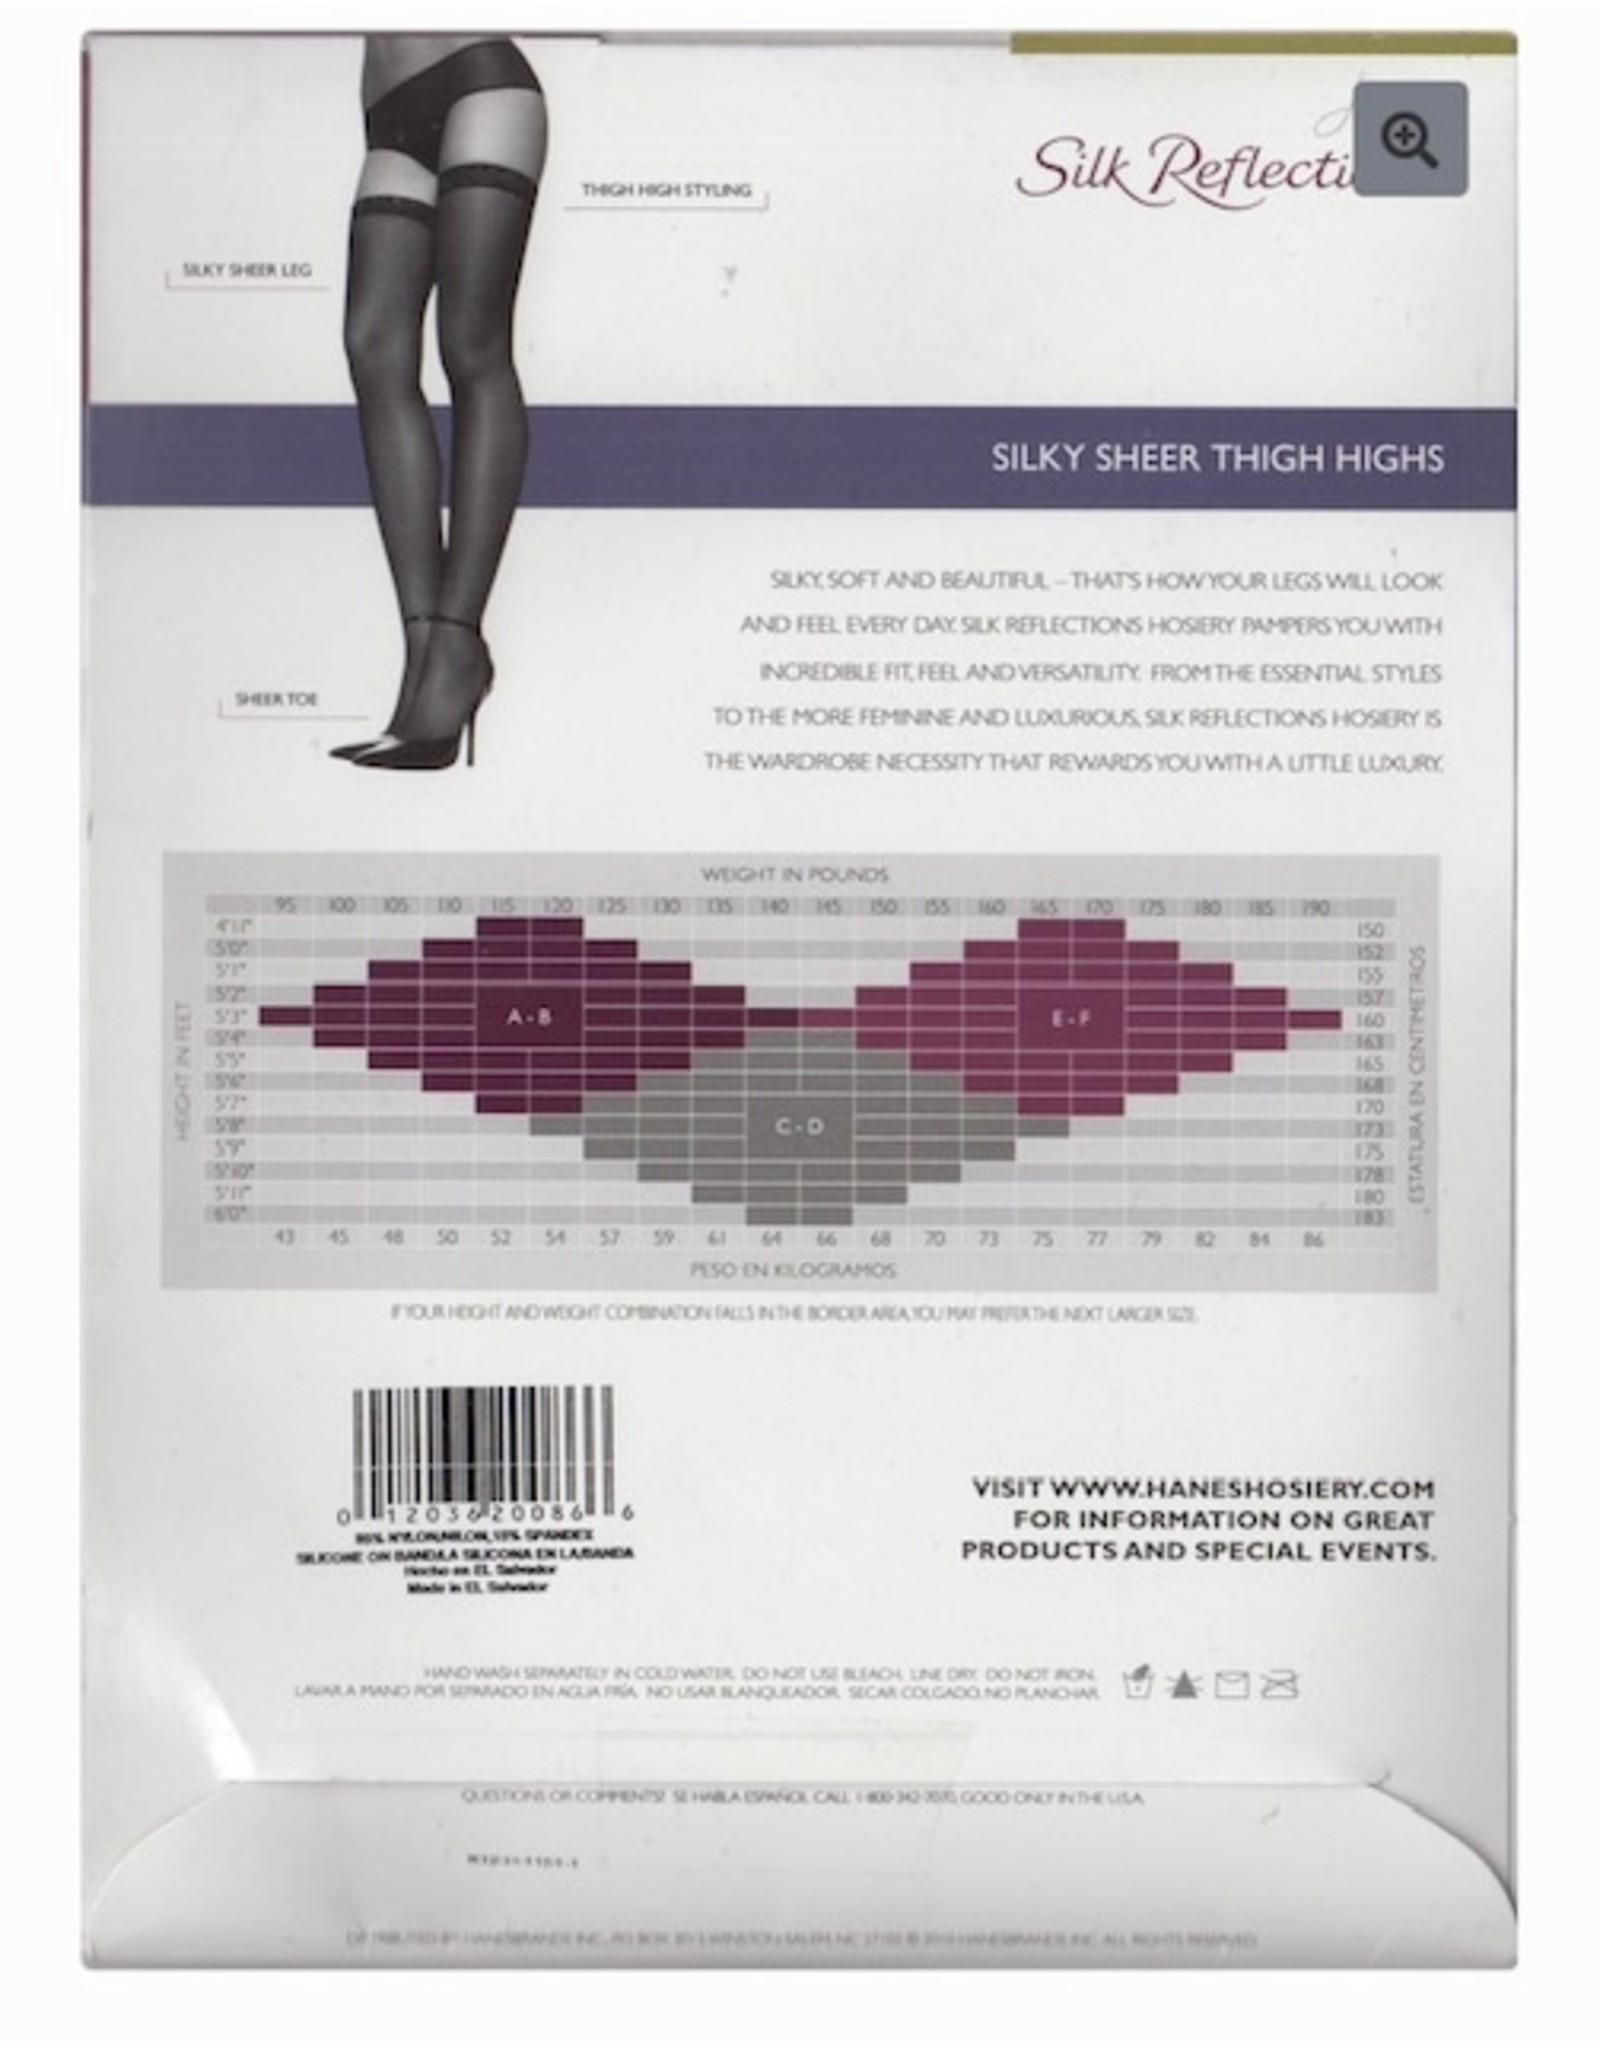 Hanes Hanes Women's Silky Sheer Sandalfoot Thigh Highs 720